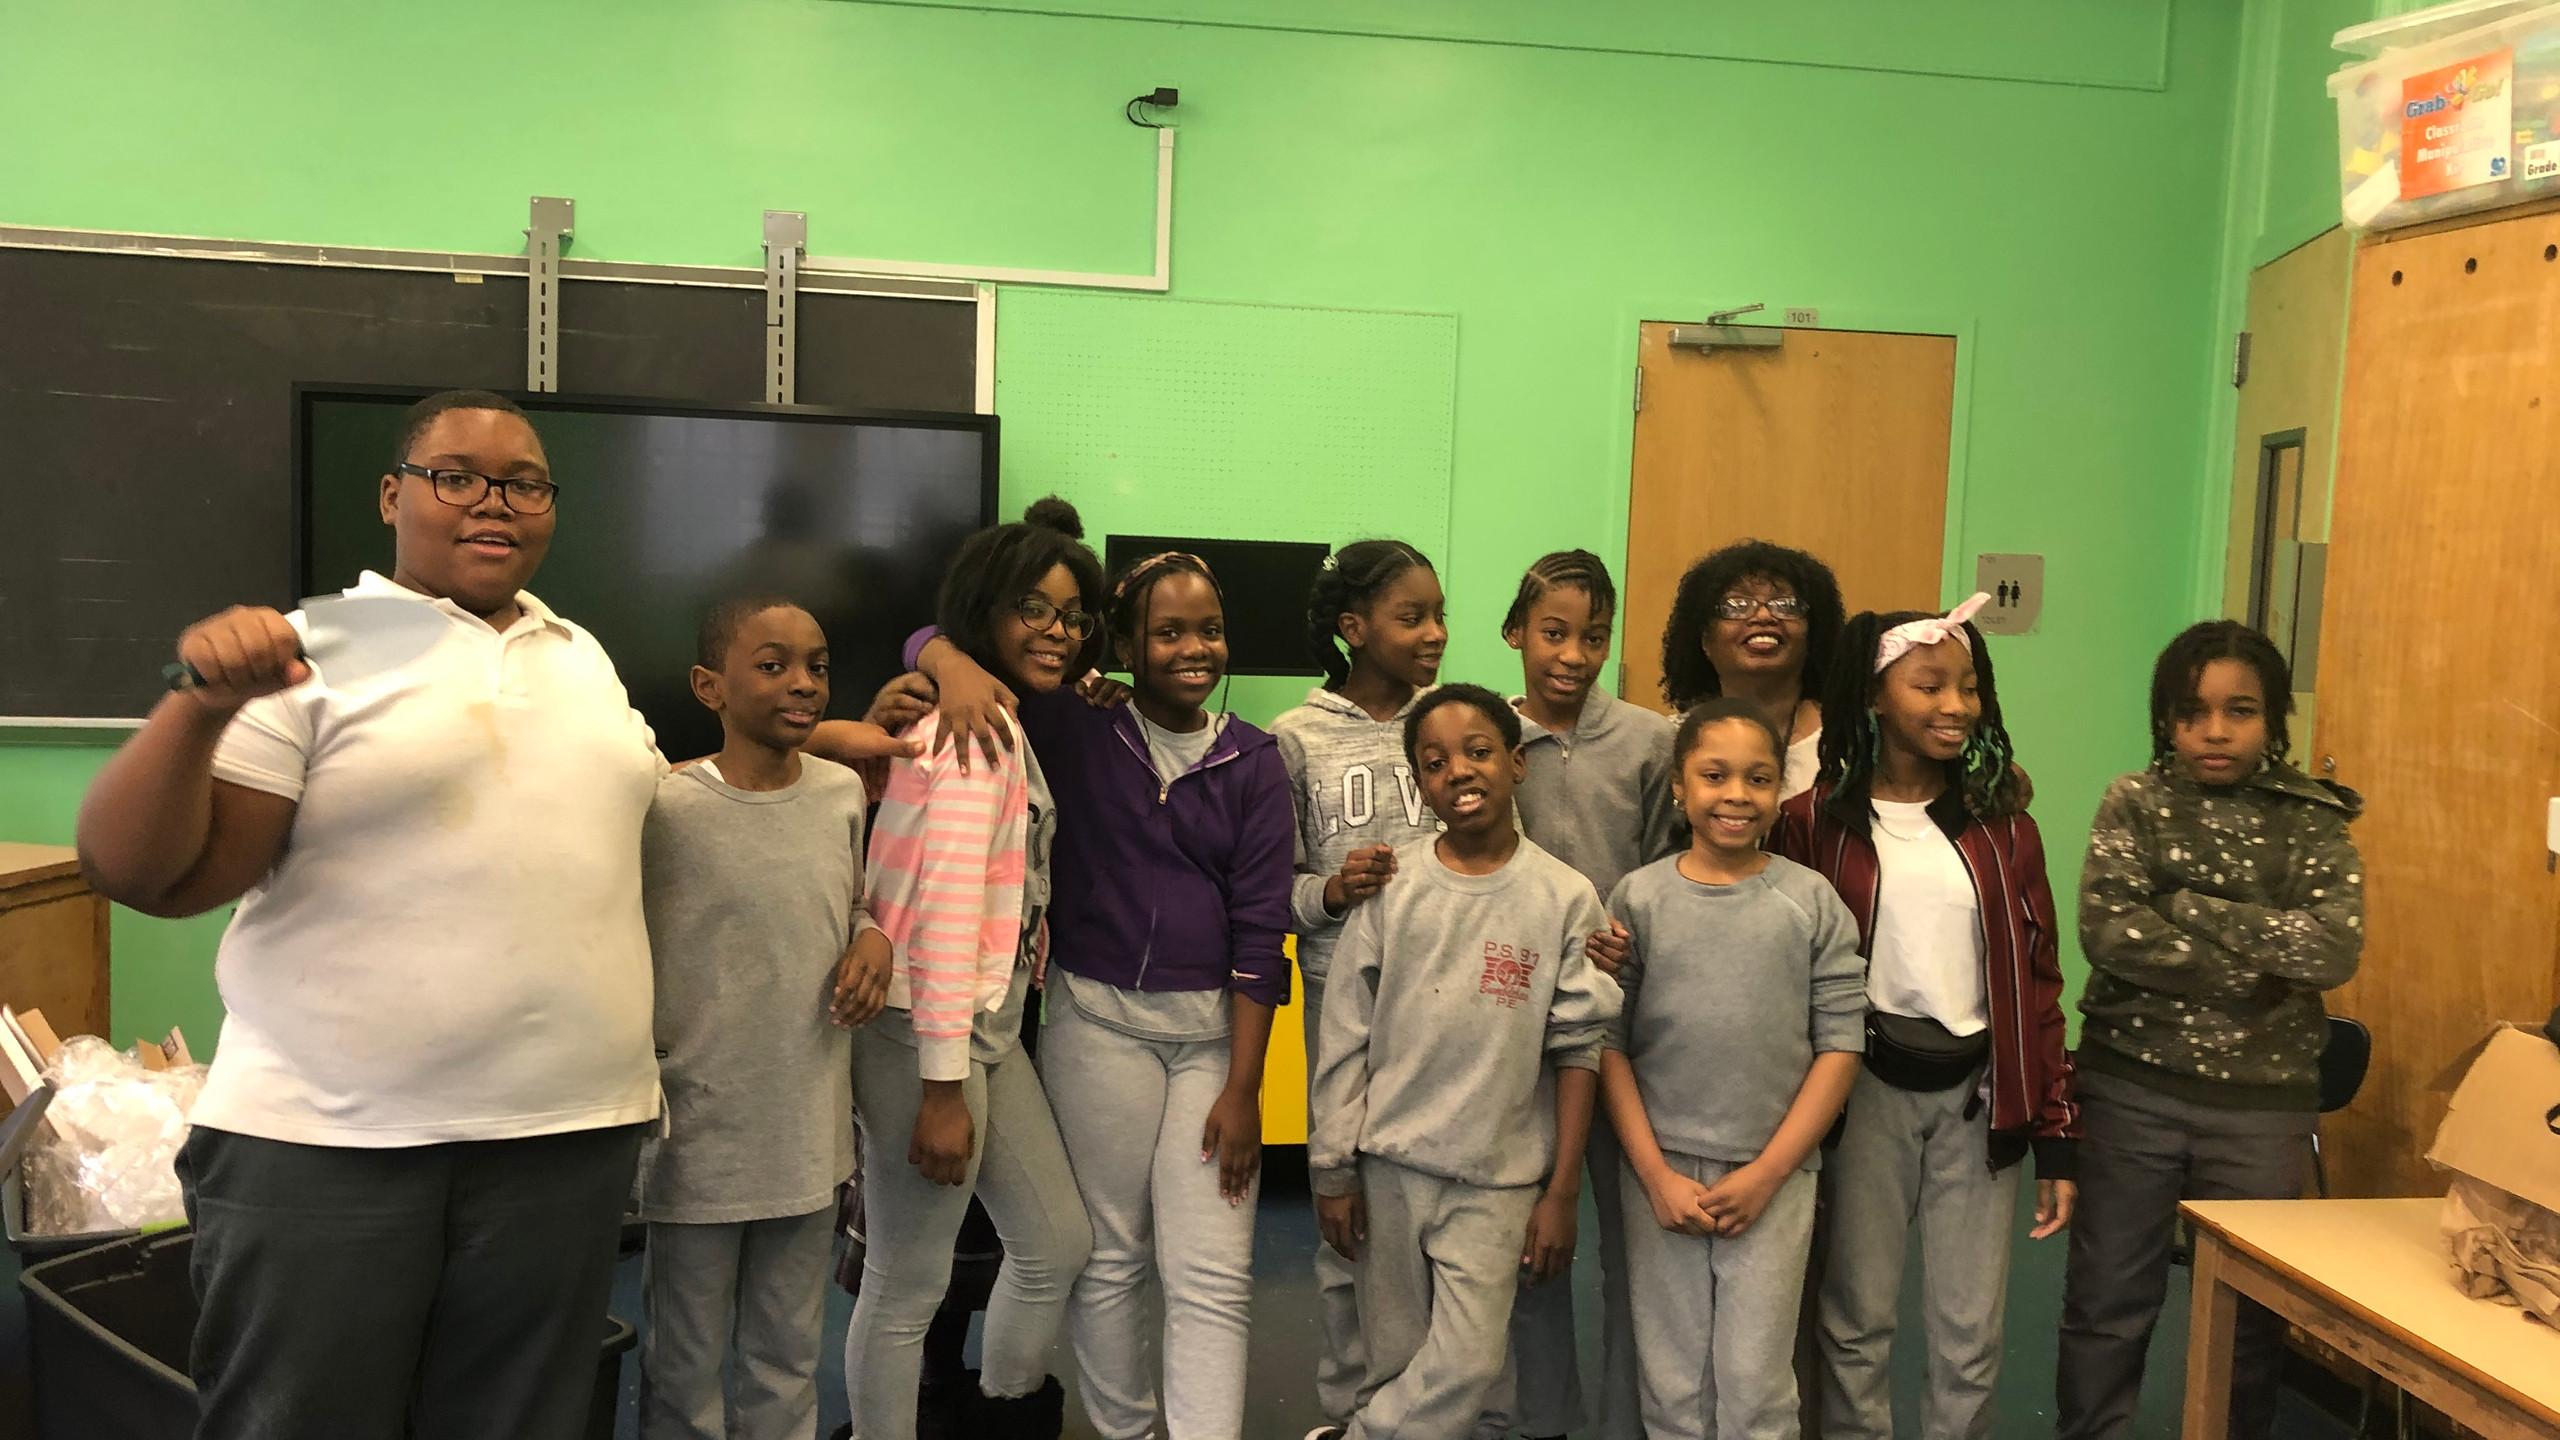 Ms Mack's STEM Students